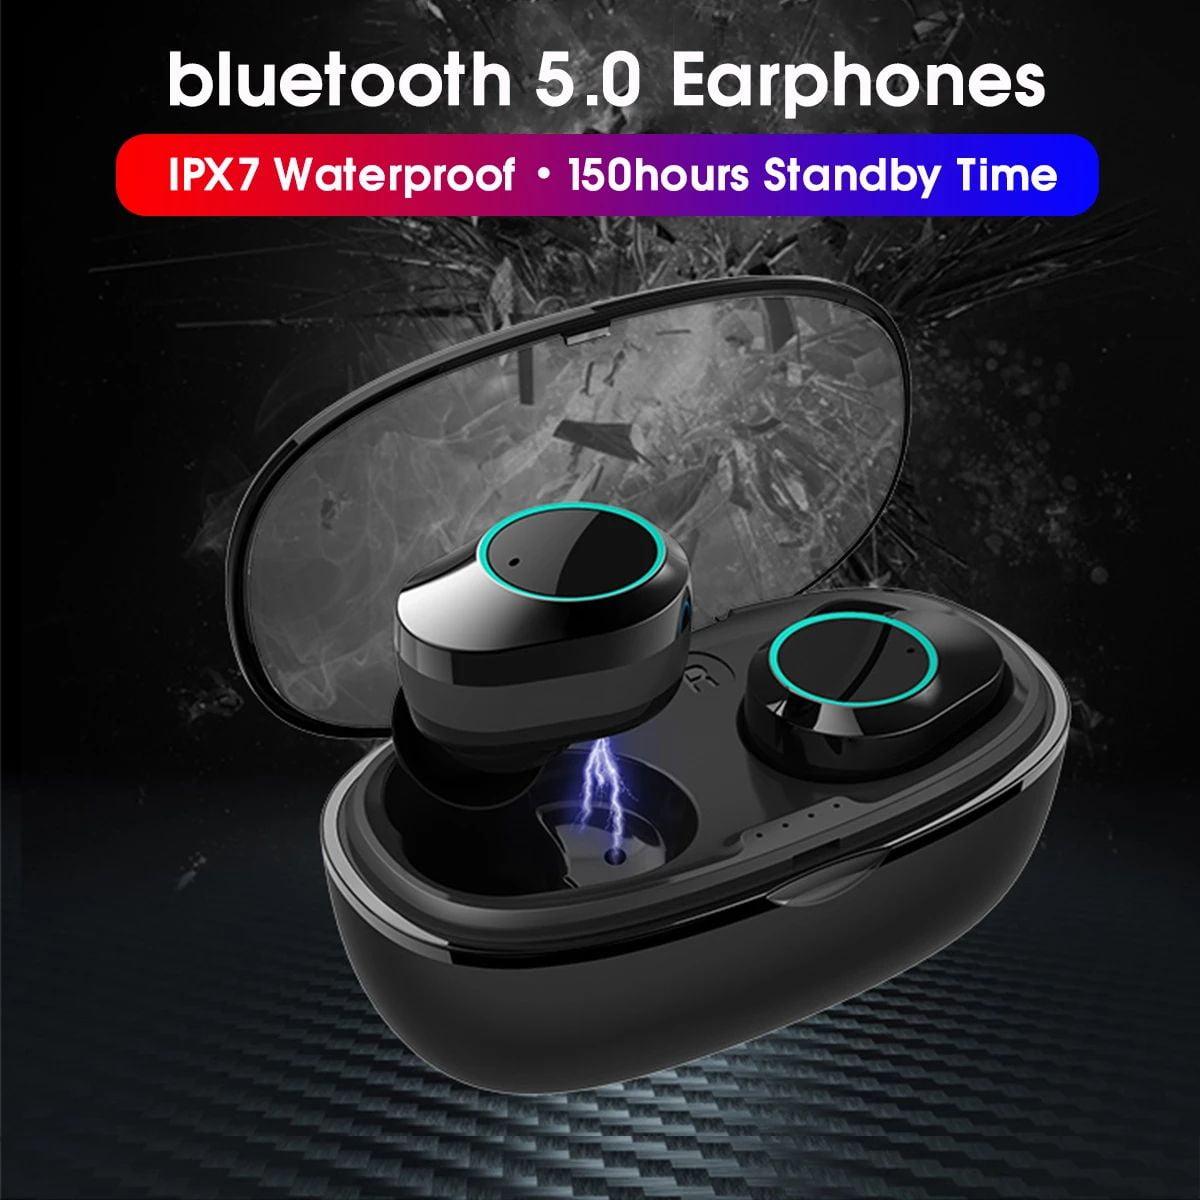 T2C TWS Bluetooth 5.0 earphone hifi stereo type-c charging case wholesale china 1 (3)